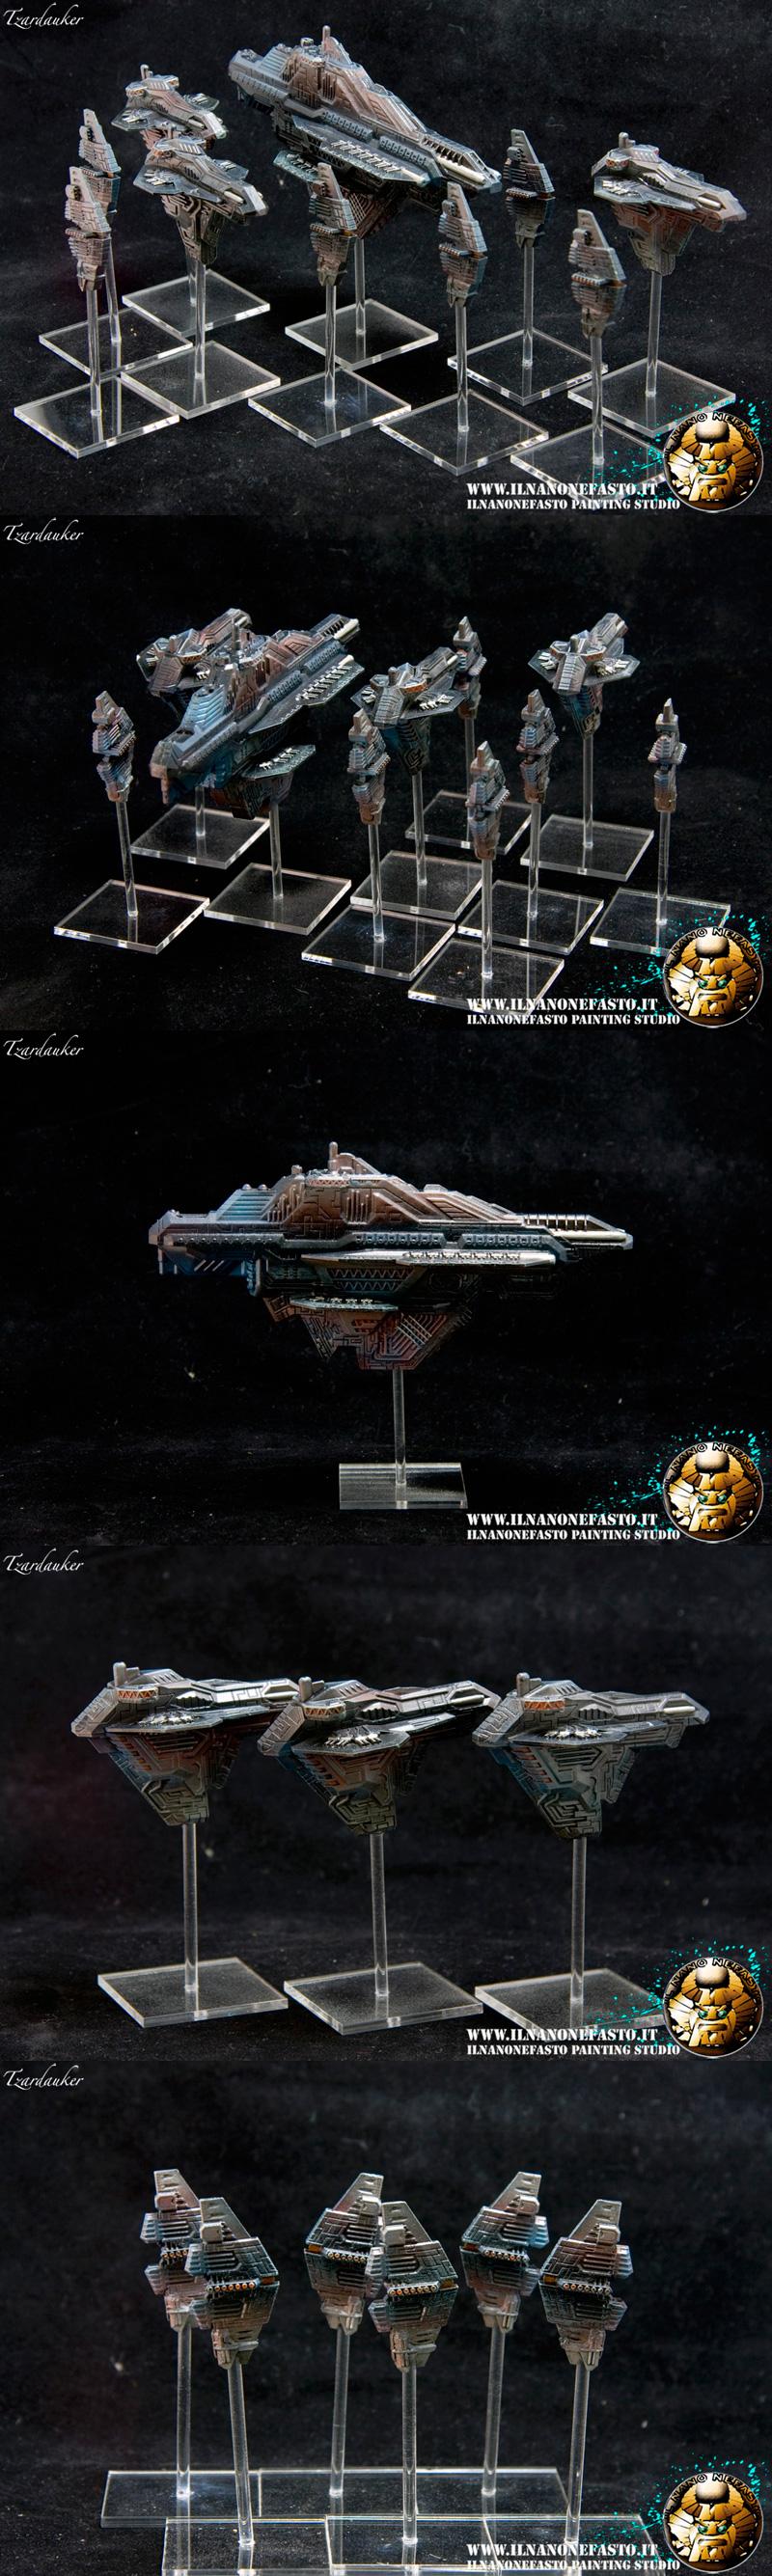 Firestorm Armada - The RELTHOZA BATTLEGROUP